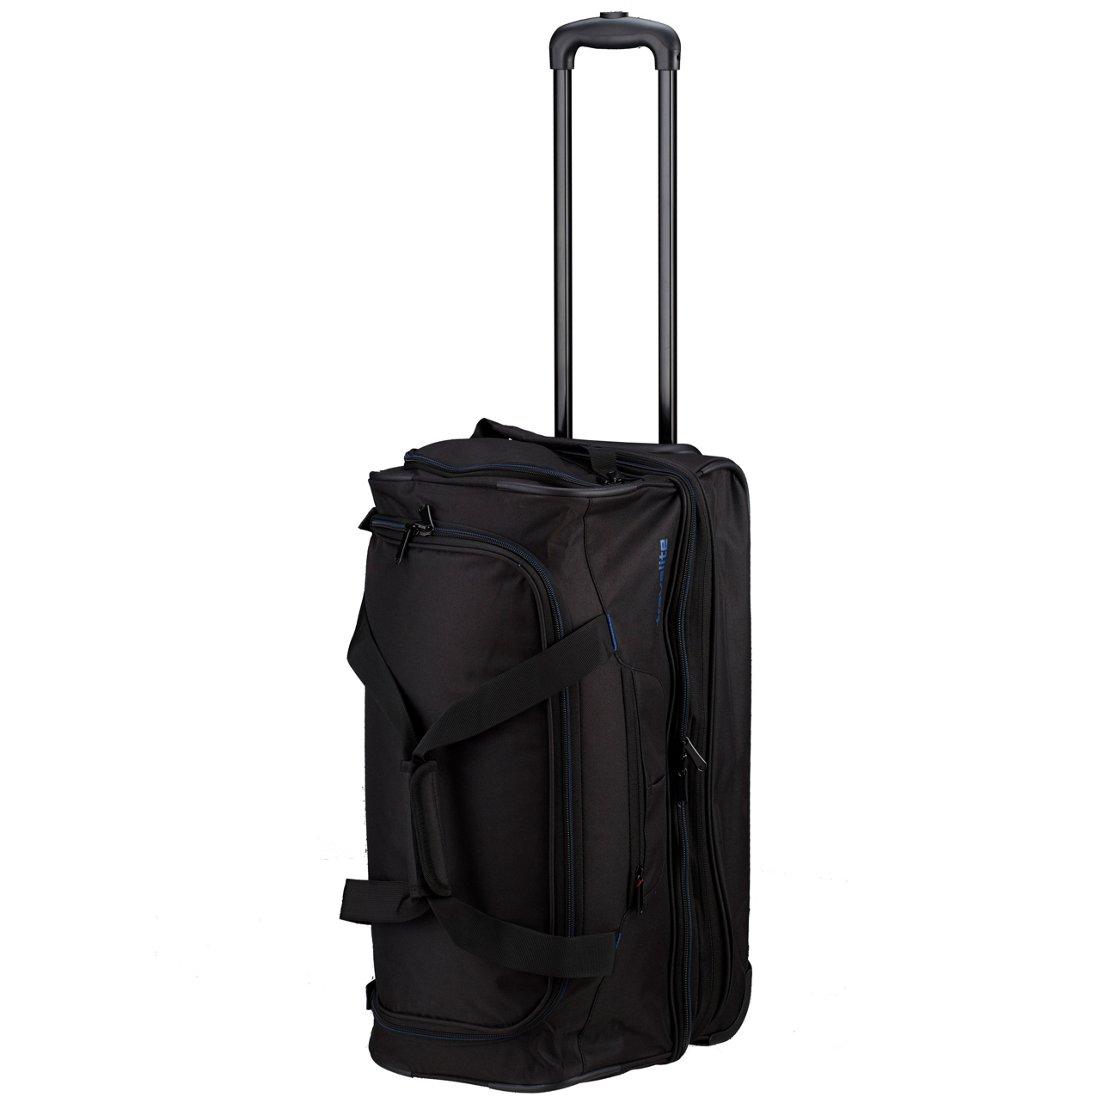 Travelite Basics Trolley Reisetasche 55 Cm Koffer Direktde